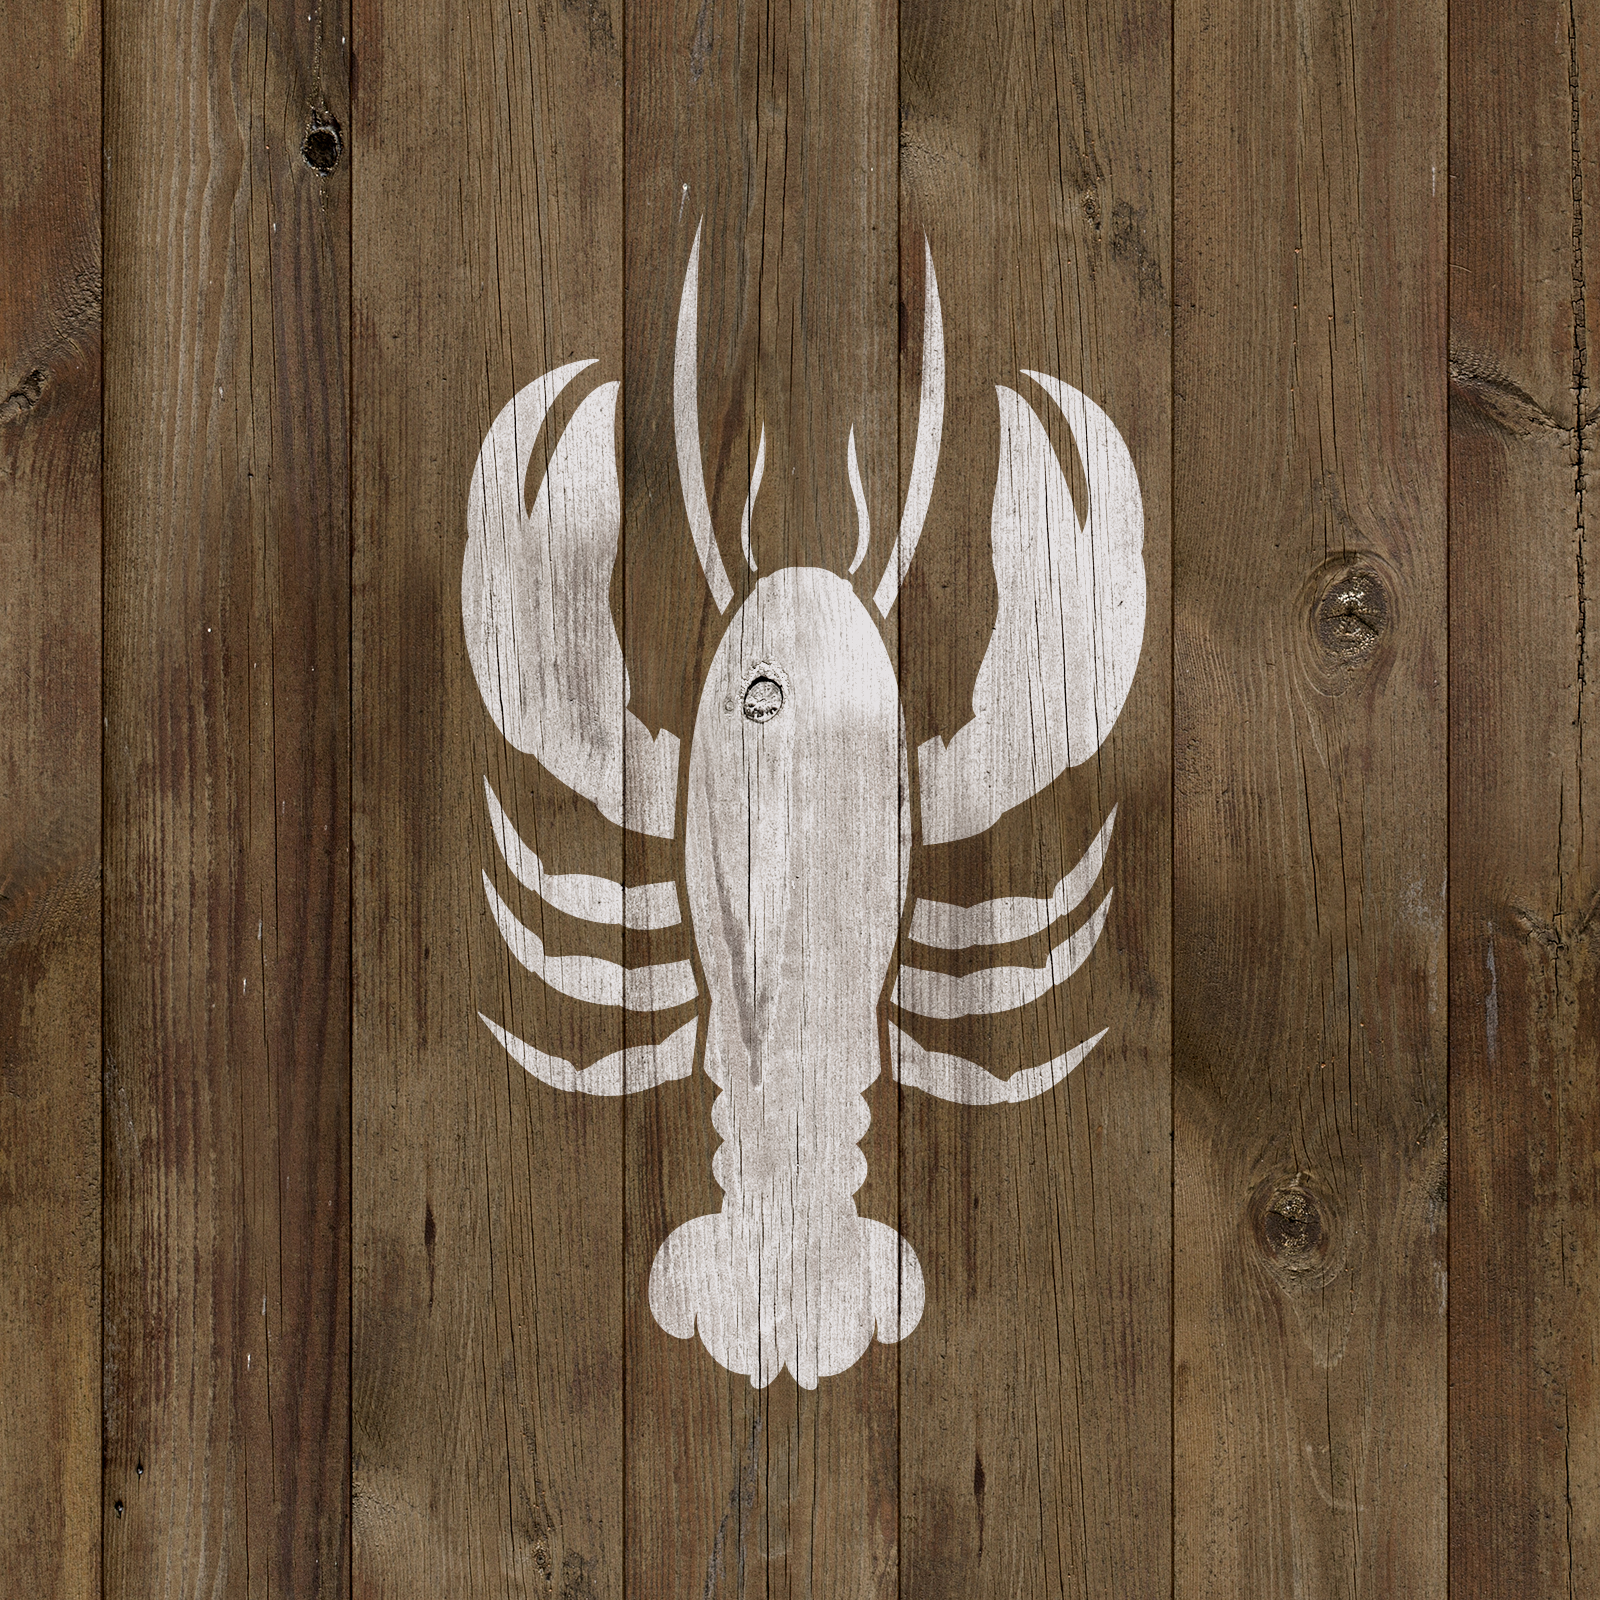 Lobster Stencil - Durable & Reusable Mylar Stencils